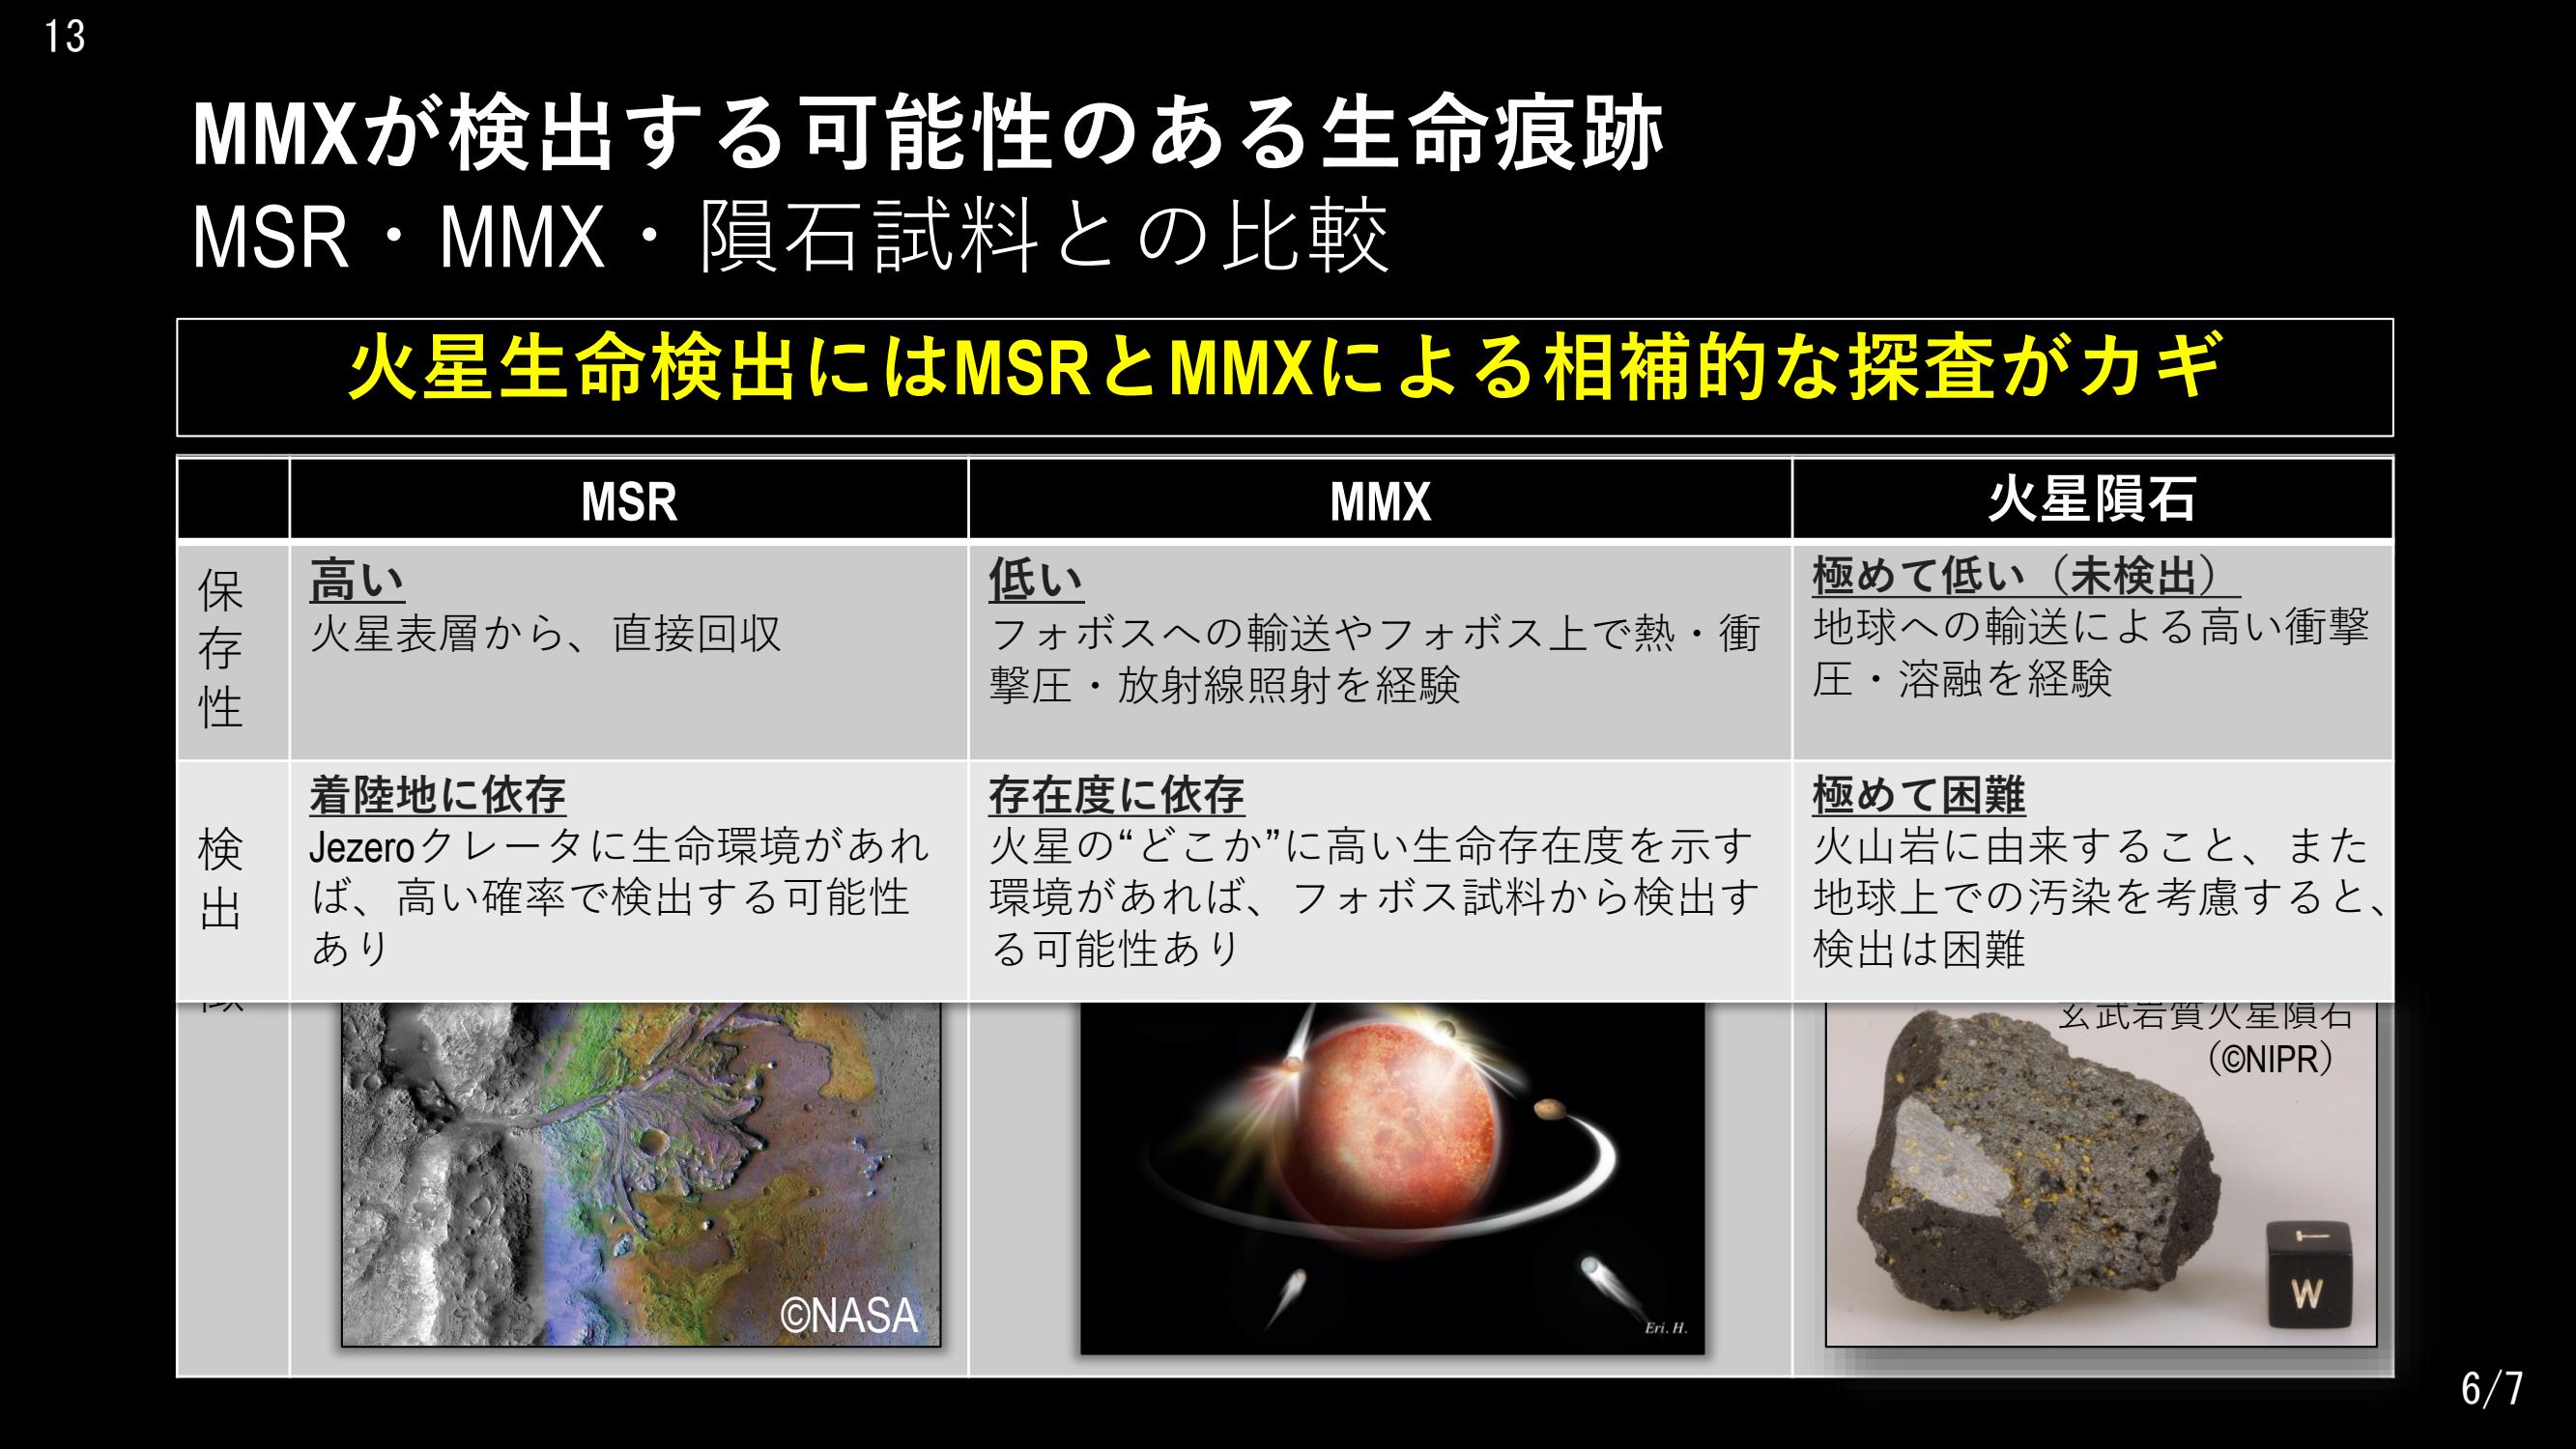 f:id:Imamura:20210819095526p:plain